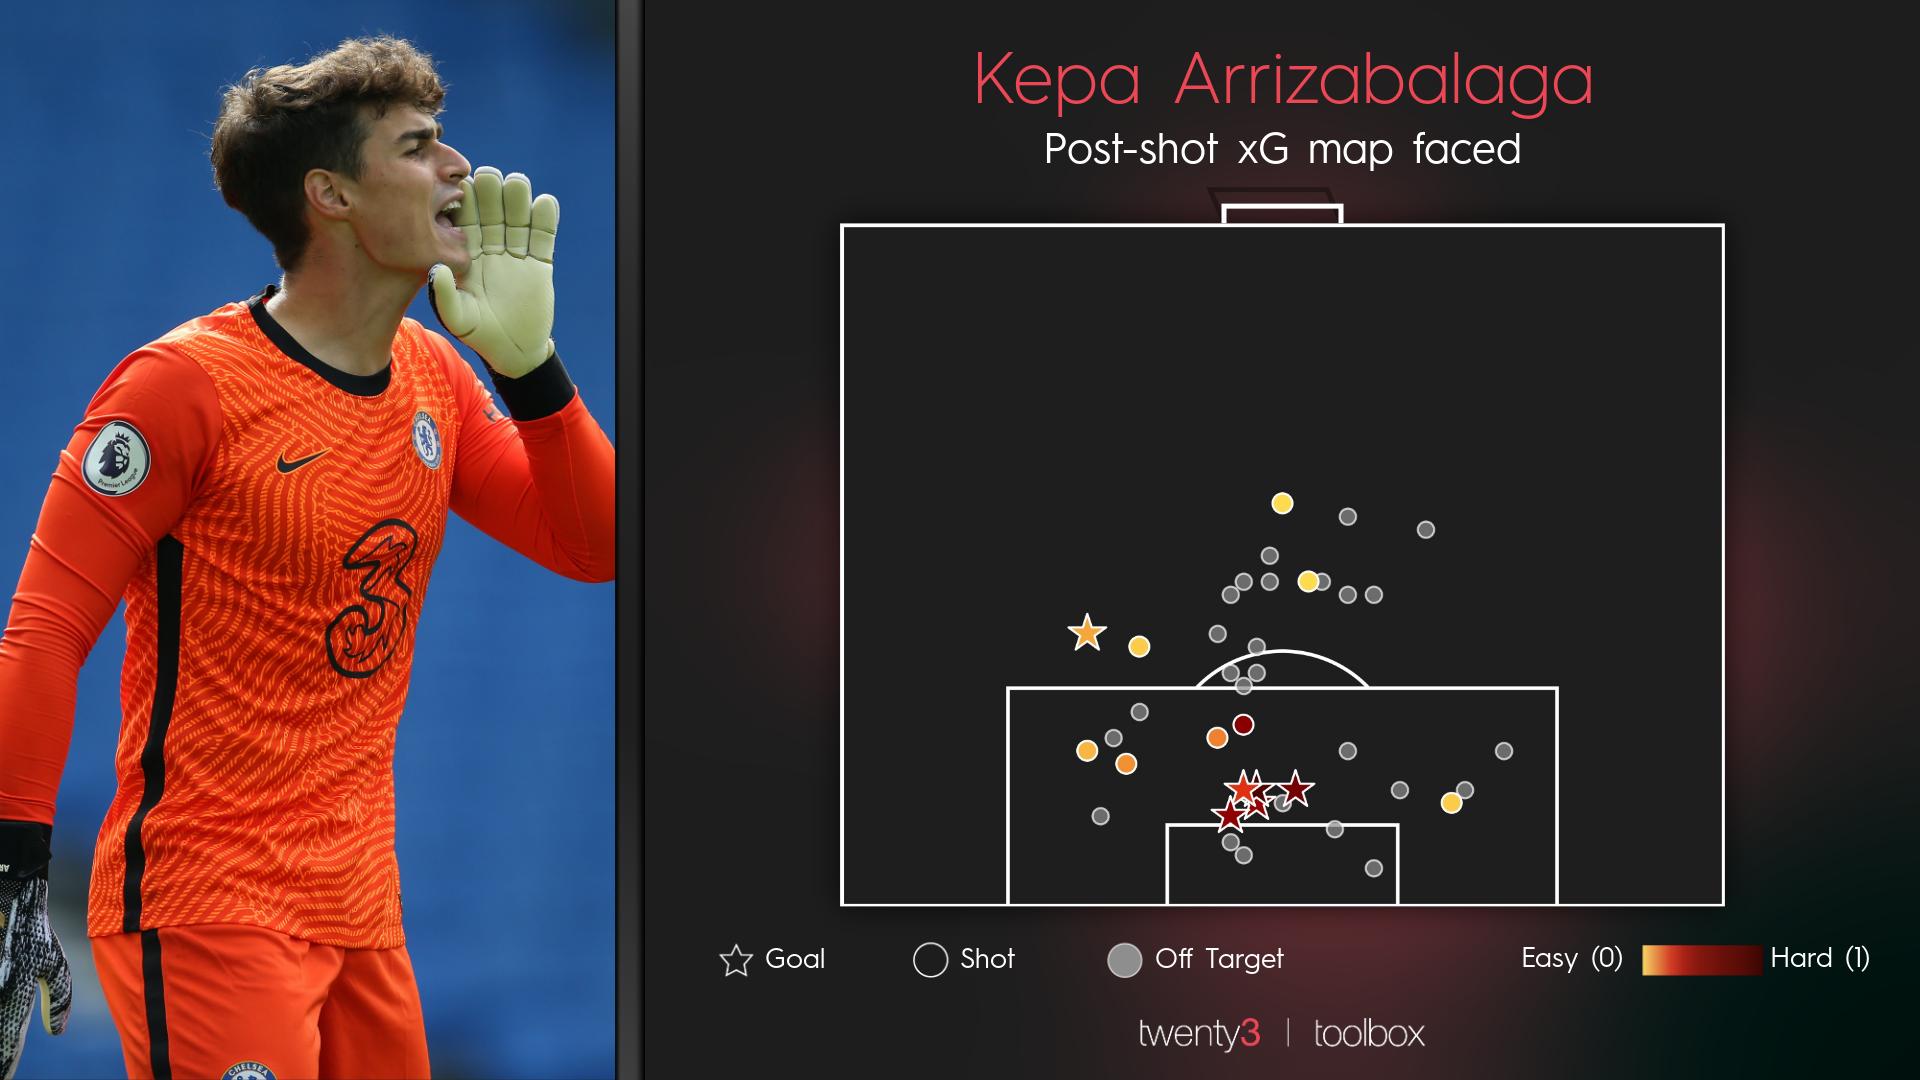 Kepa Arrizabalaga's post-shot xG faced at Chelsea